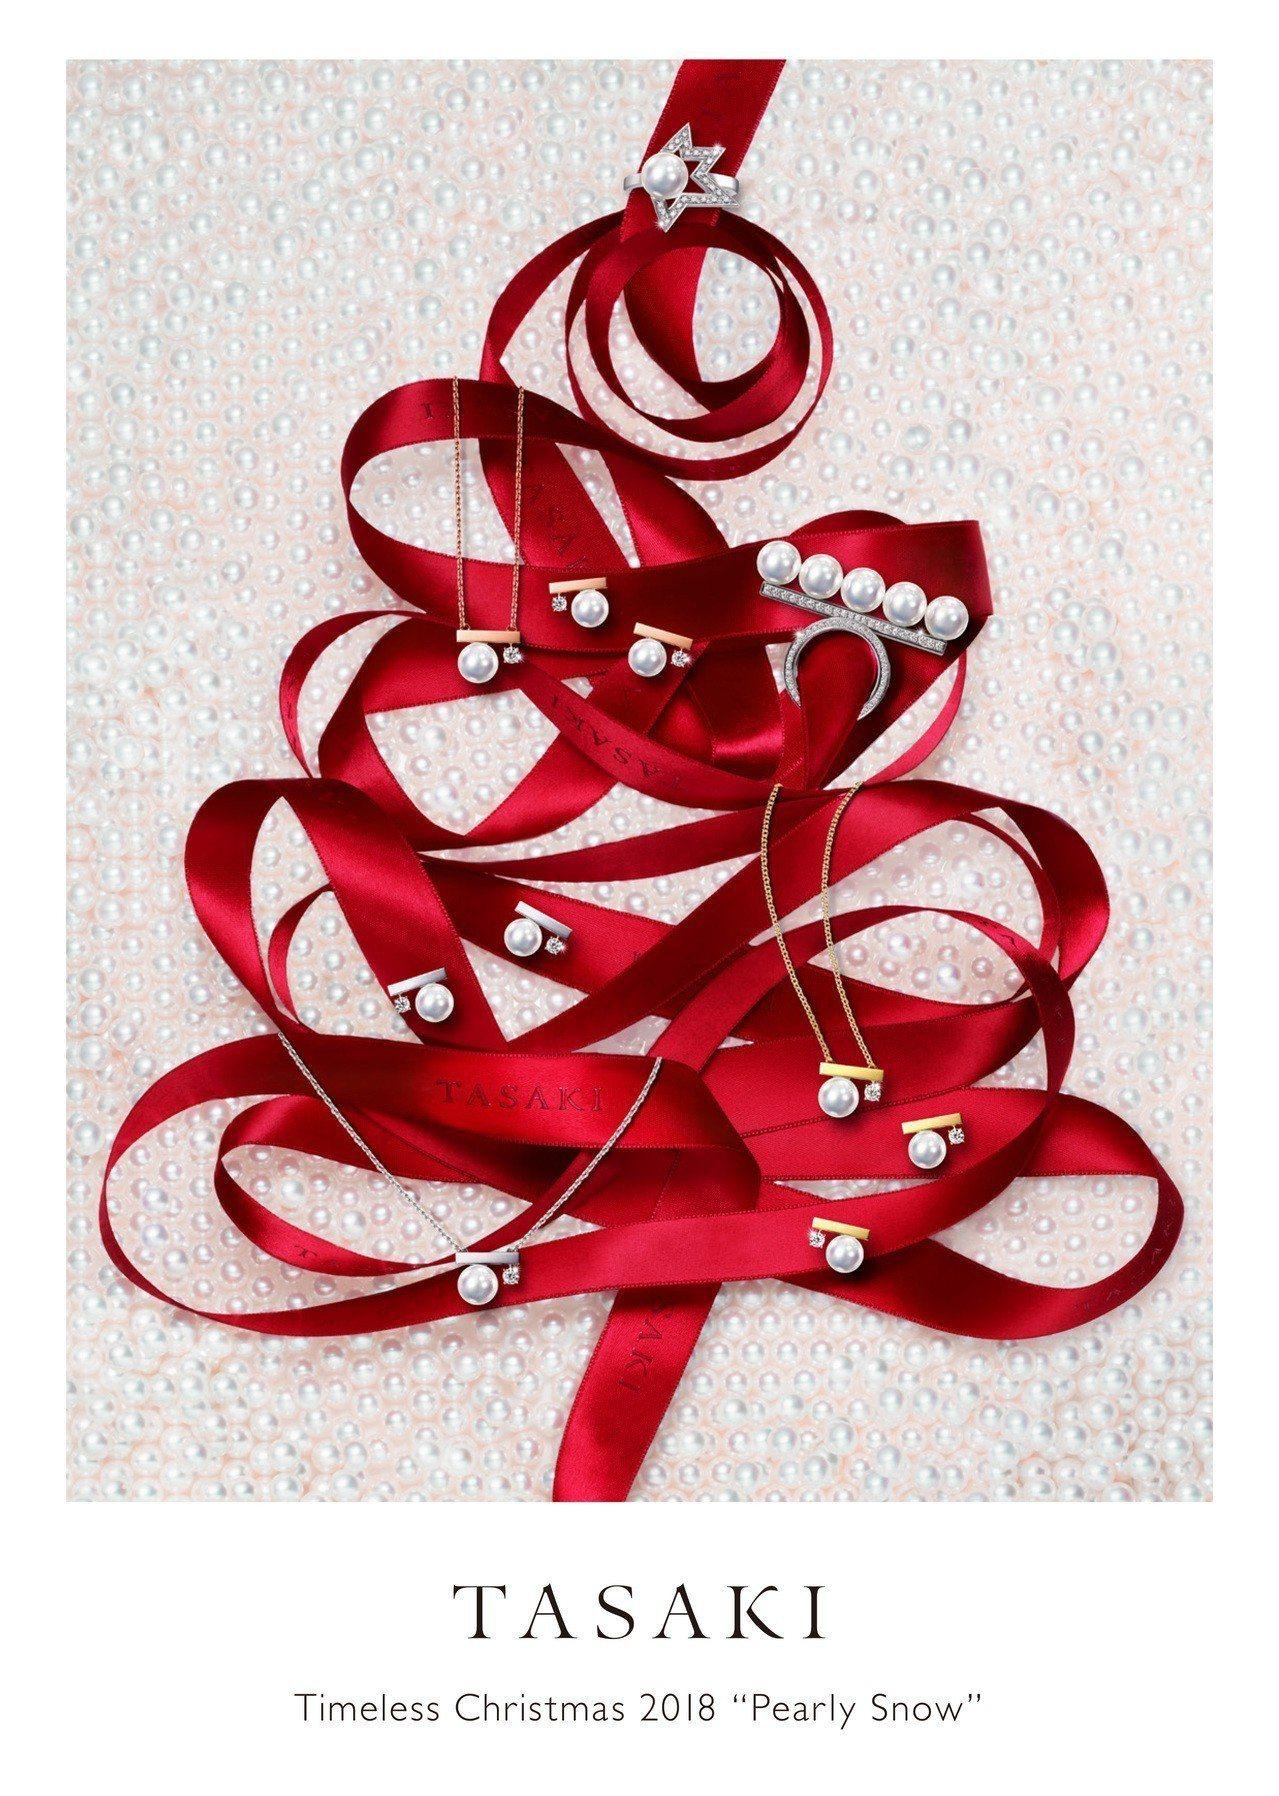 TASAKI 2018聖誕推出以珍珠和鑽石為主角的新品。圖/TASAKI提供